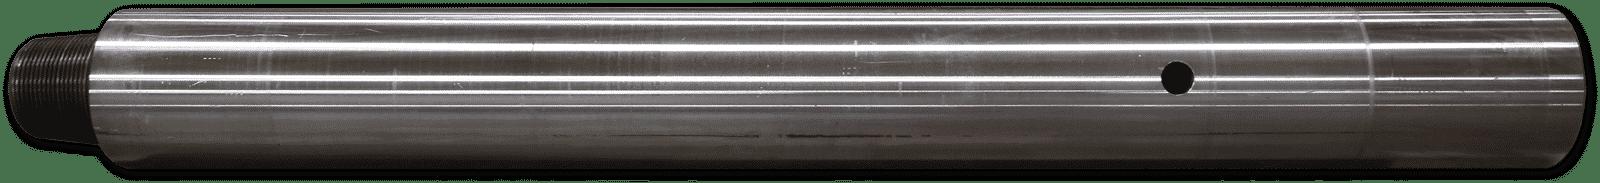 shaft 8559